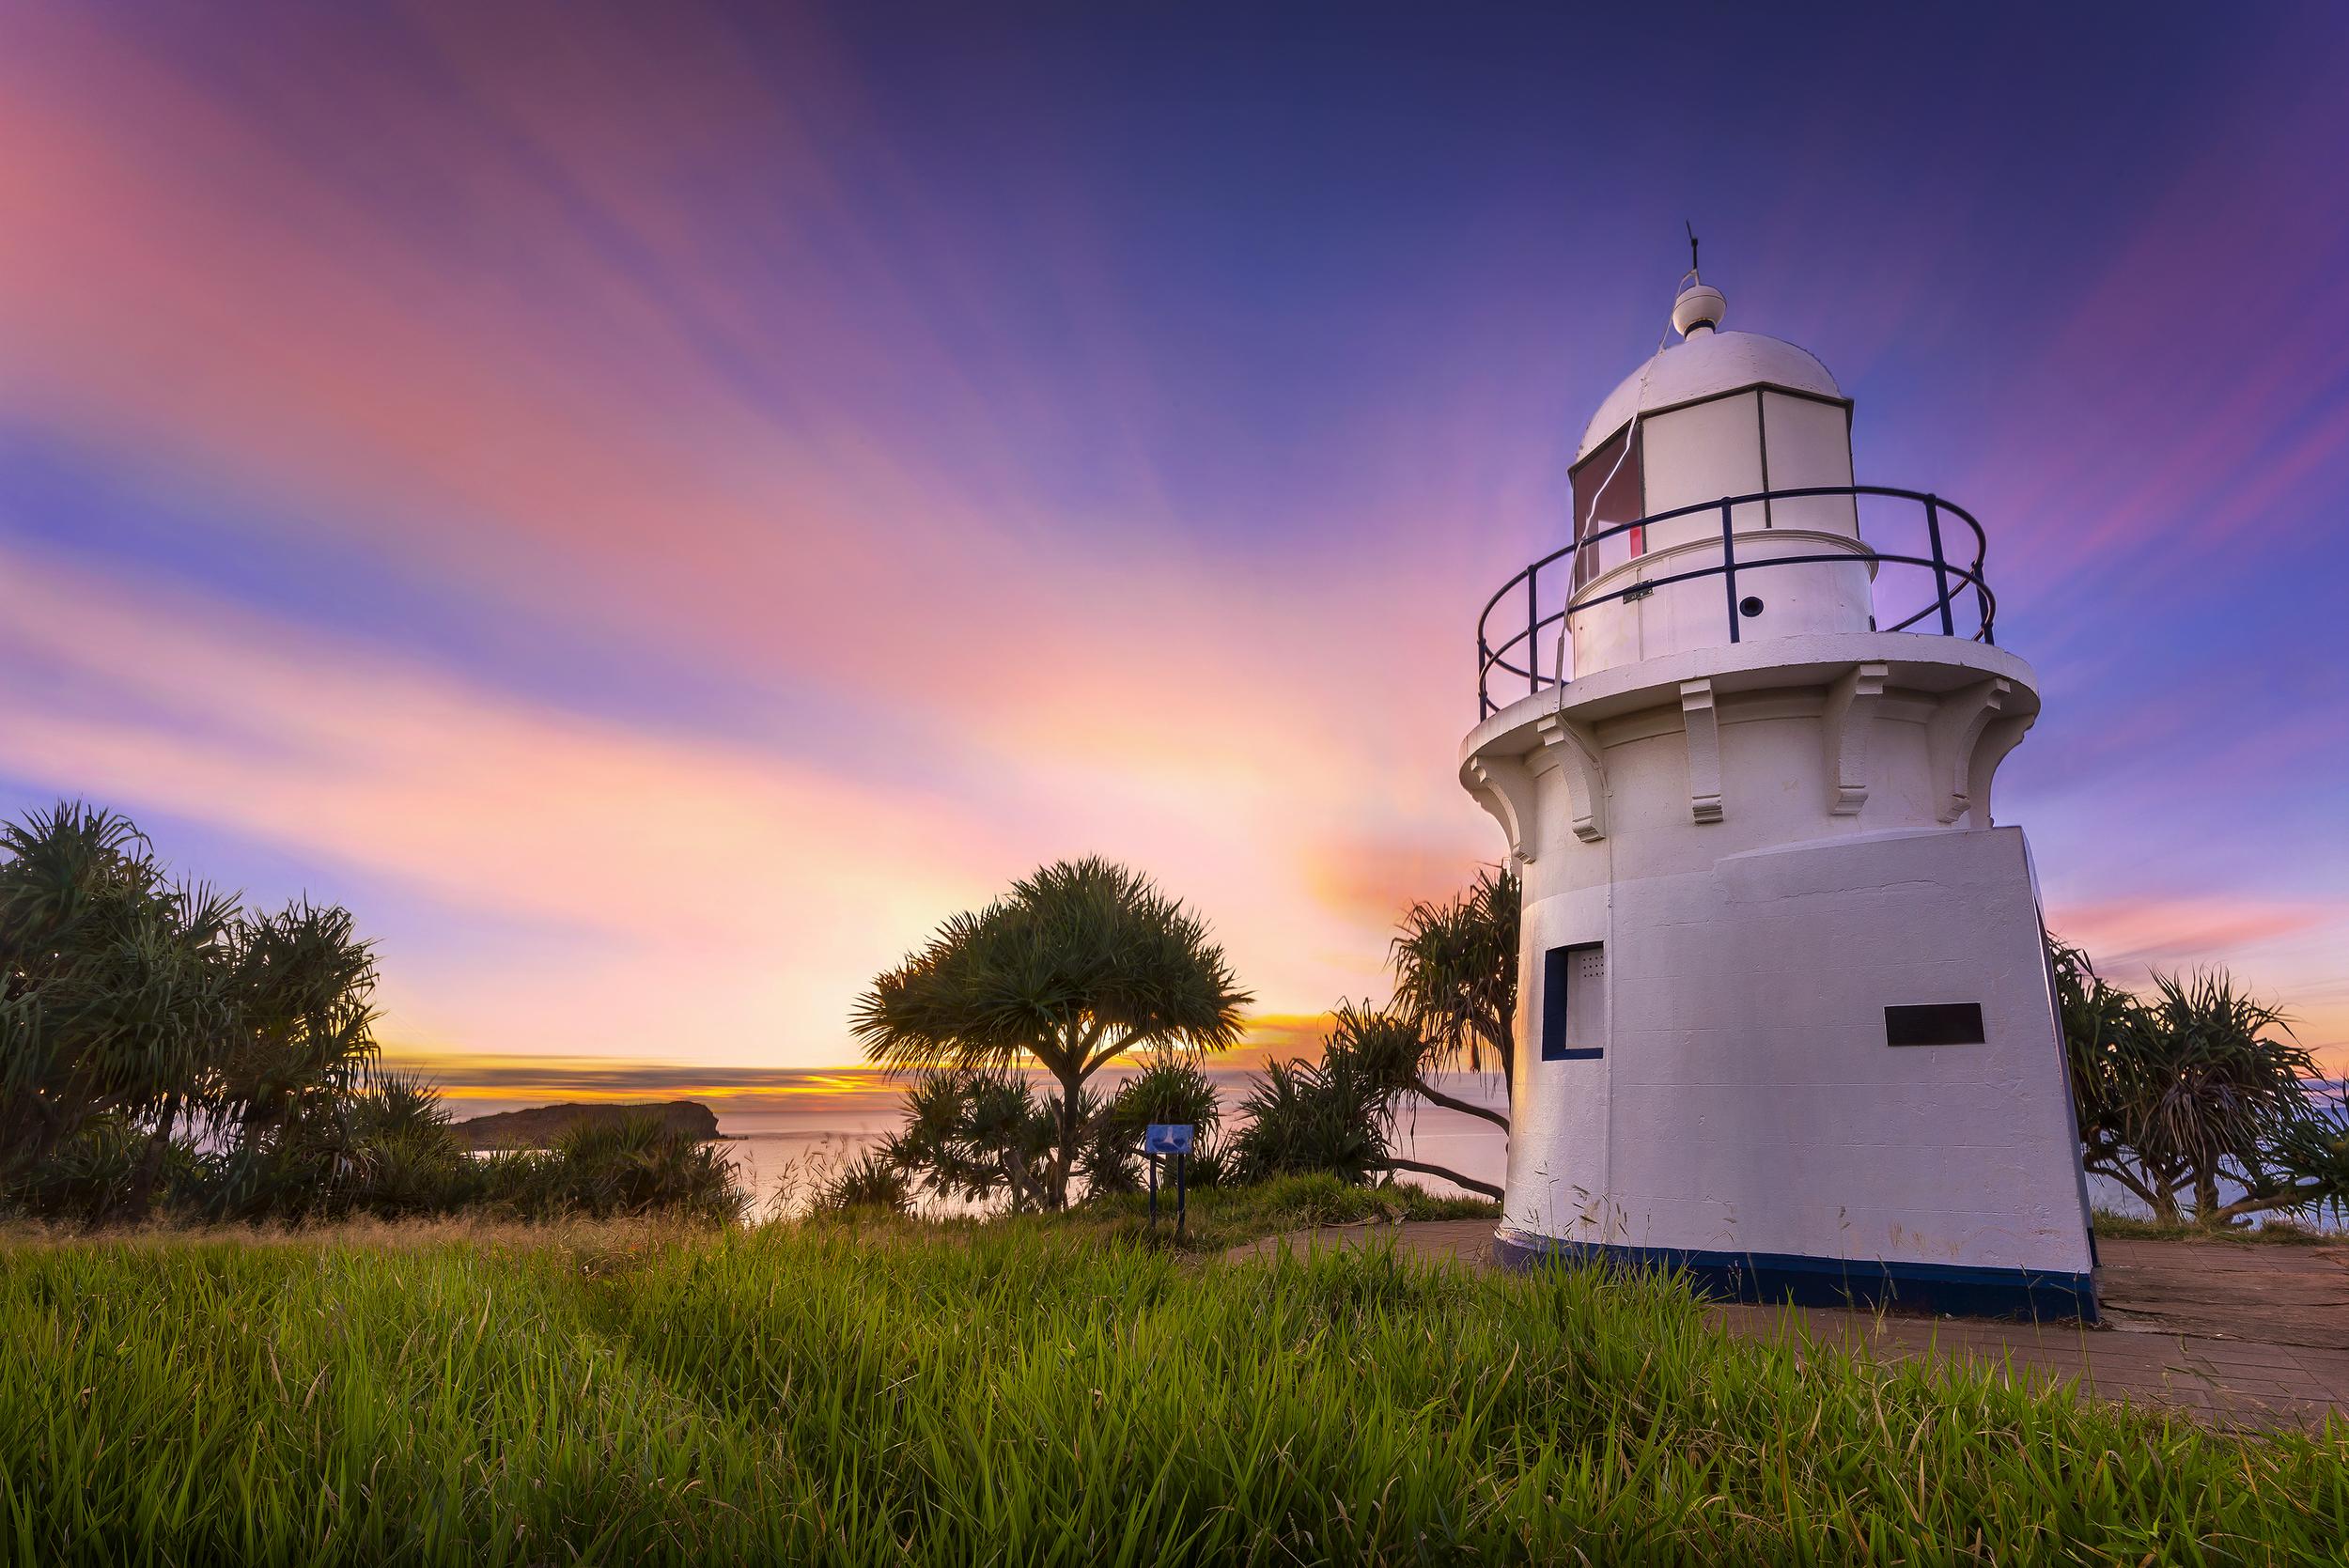 Fingal+Head+Lighthouse+#1,+NSW.+Australia.jpg